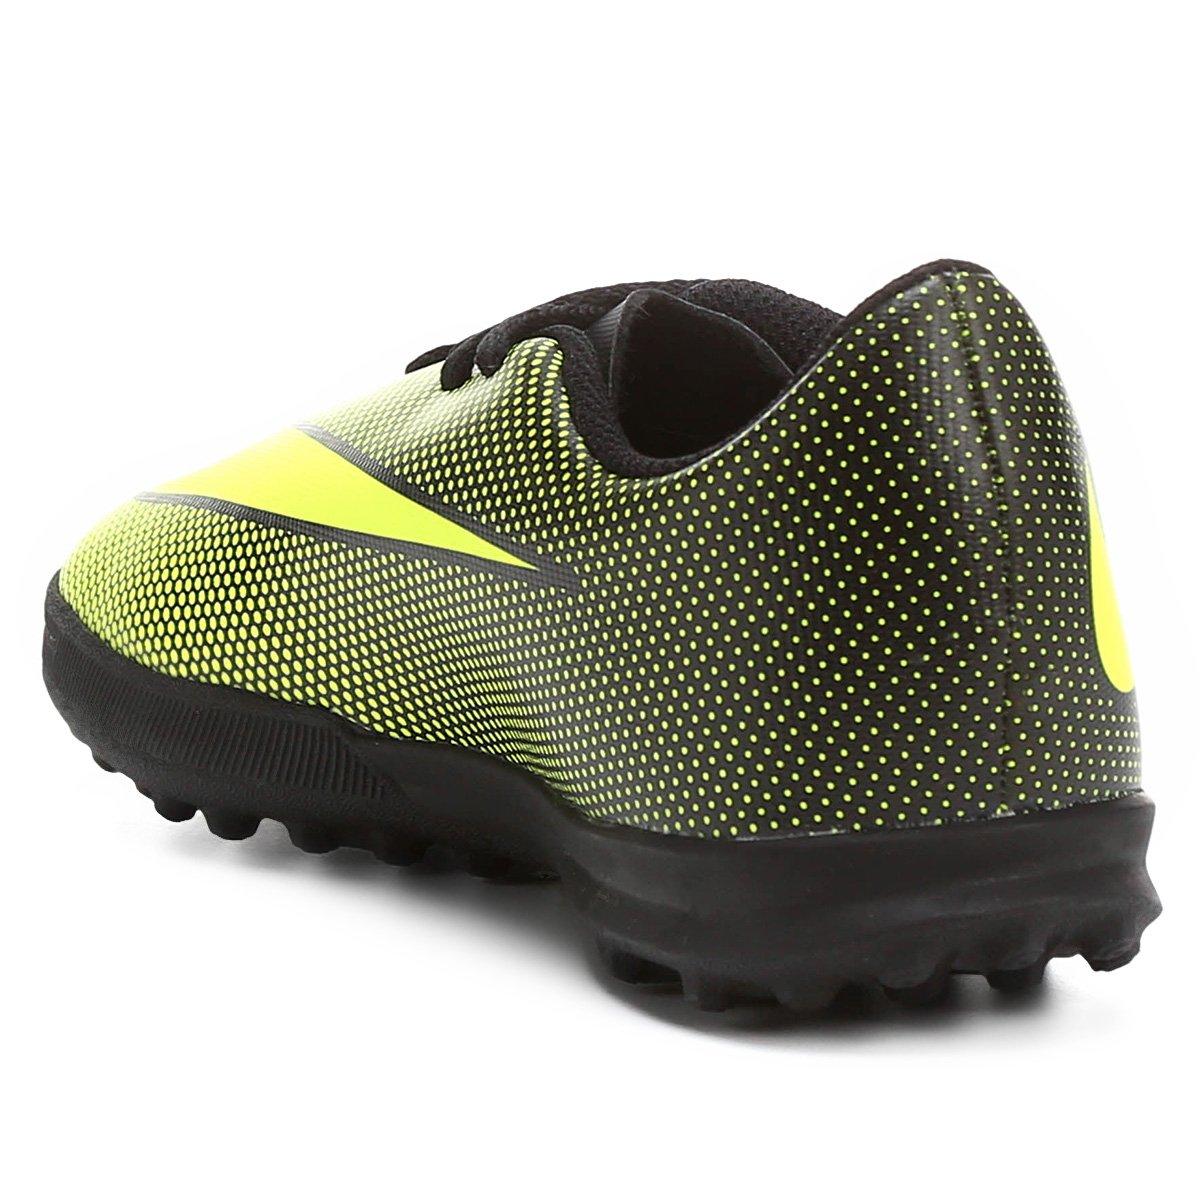 Chuteira Society Infantil Nike Bravata 2 TF - Compre Agora  7872da3dcfd82